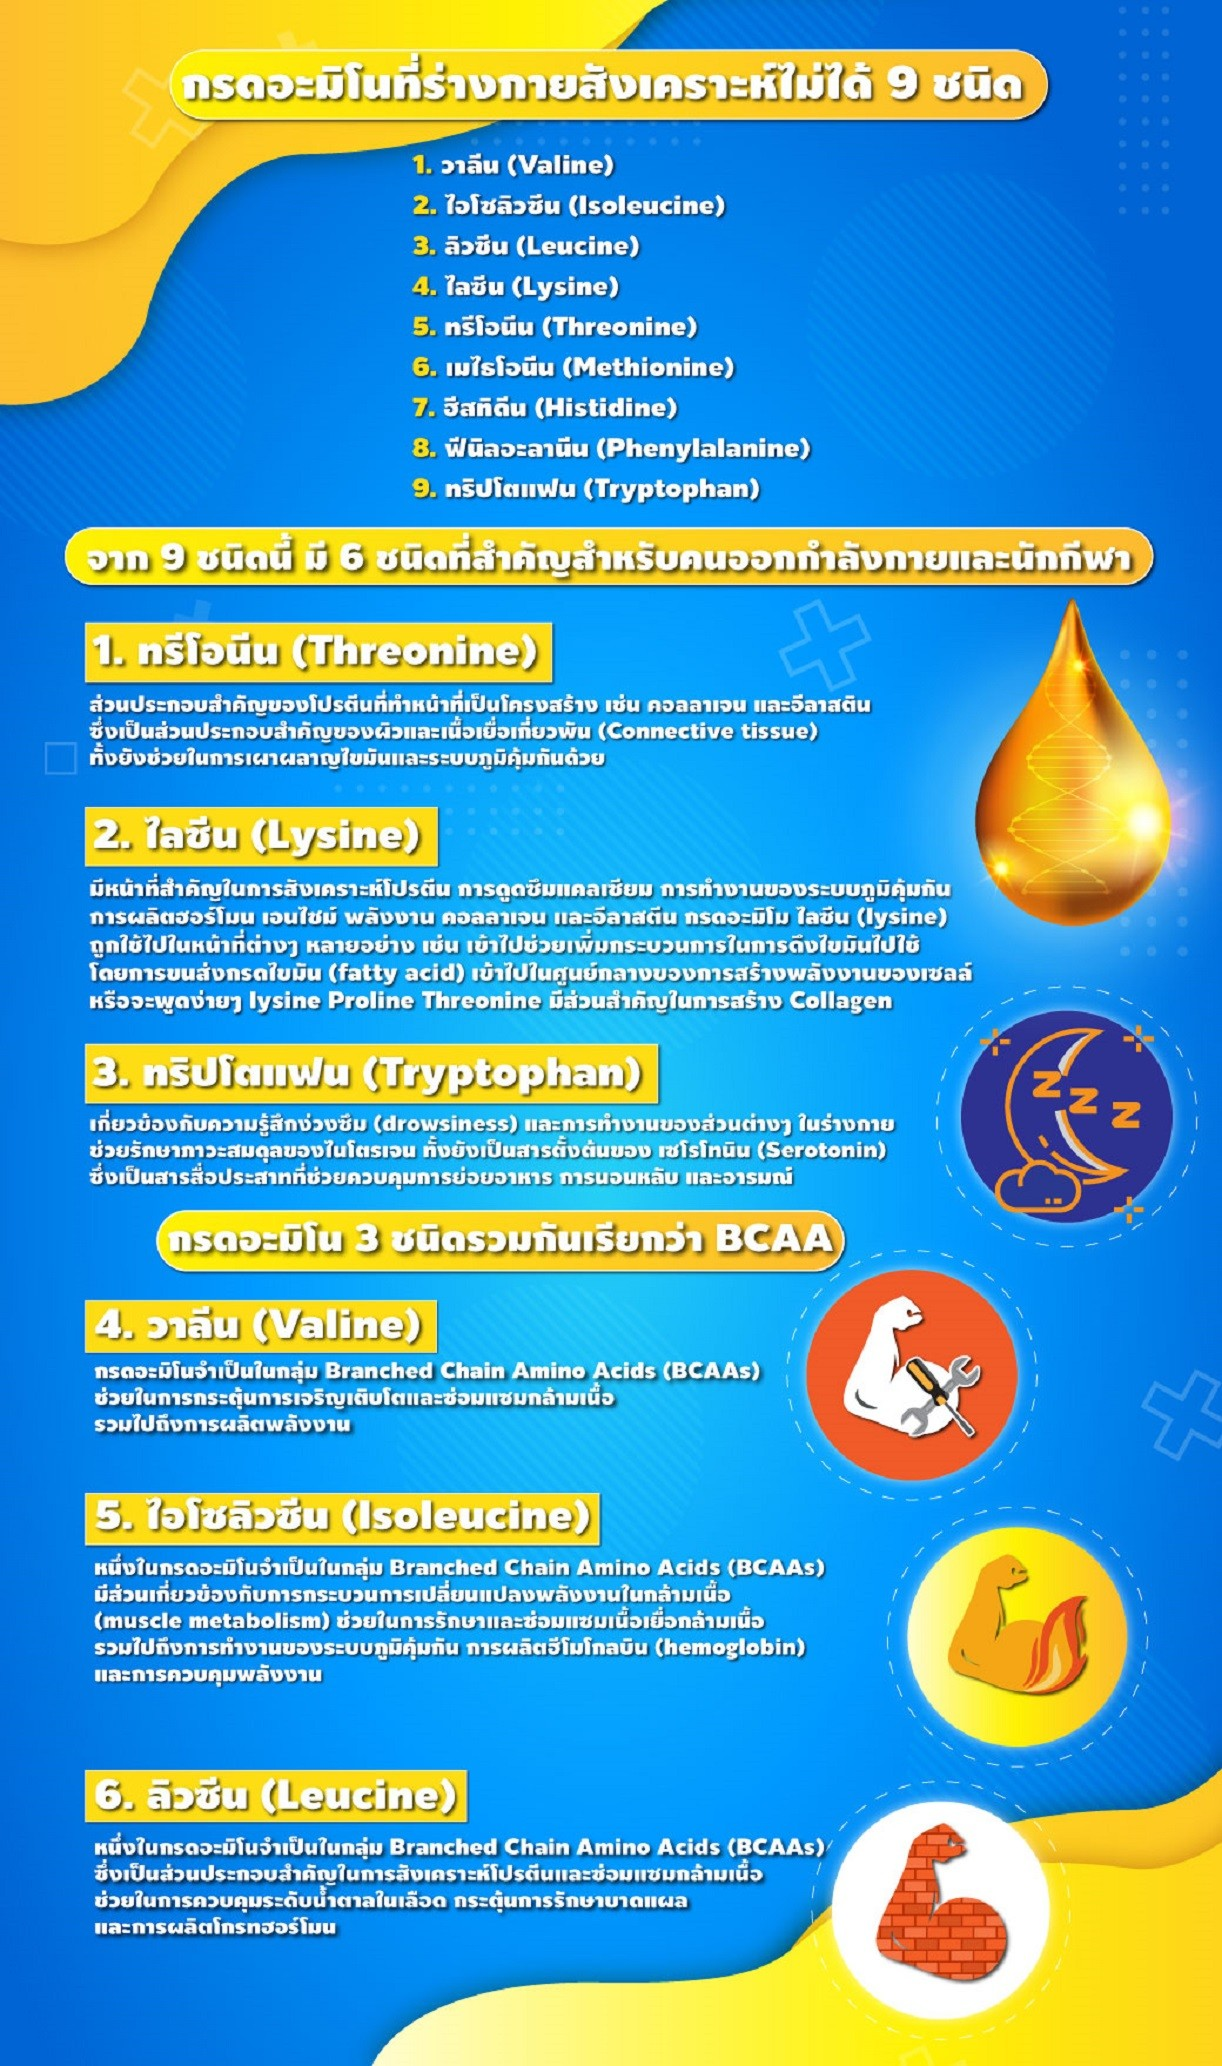 amino-content-bgc-2.jpg